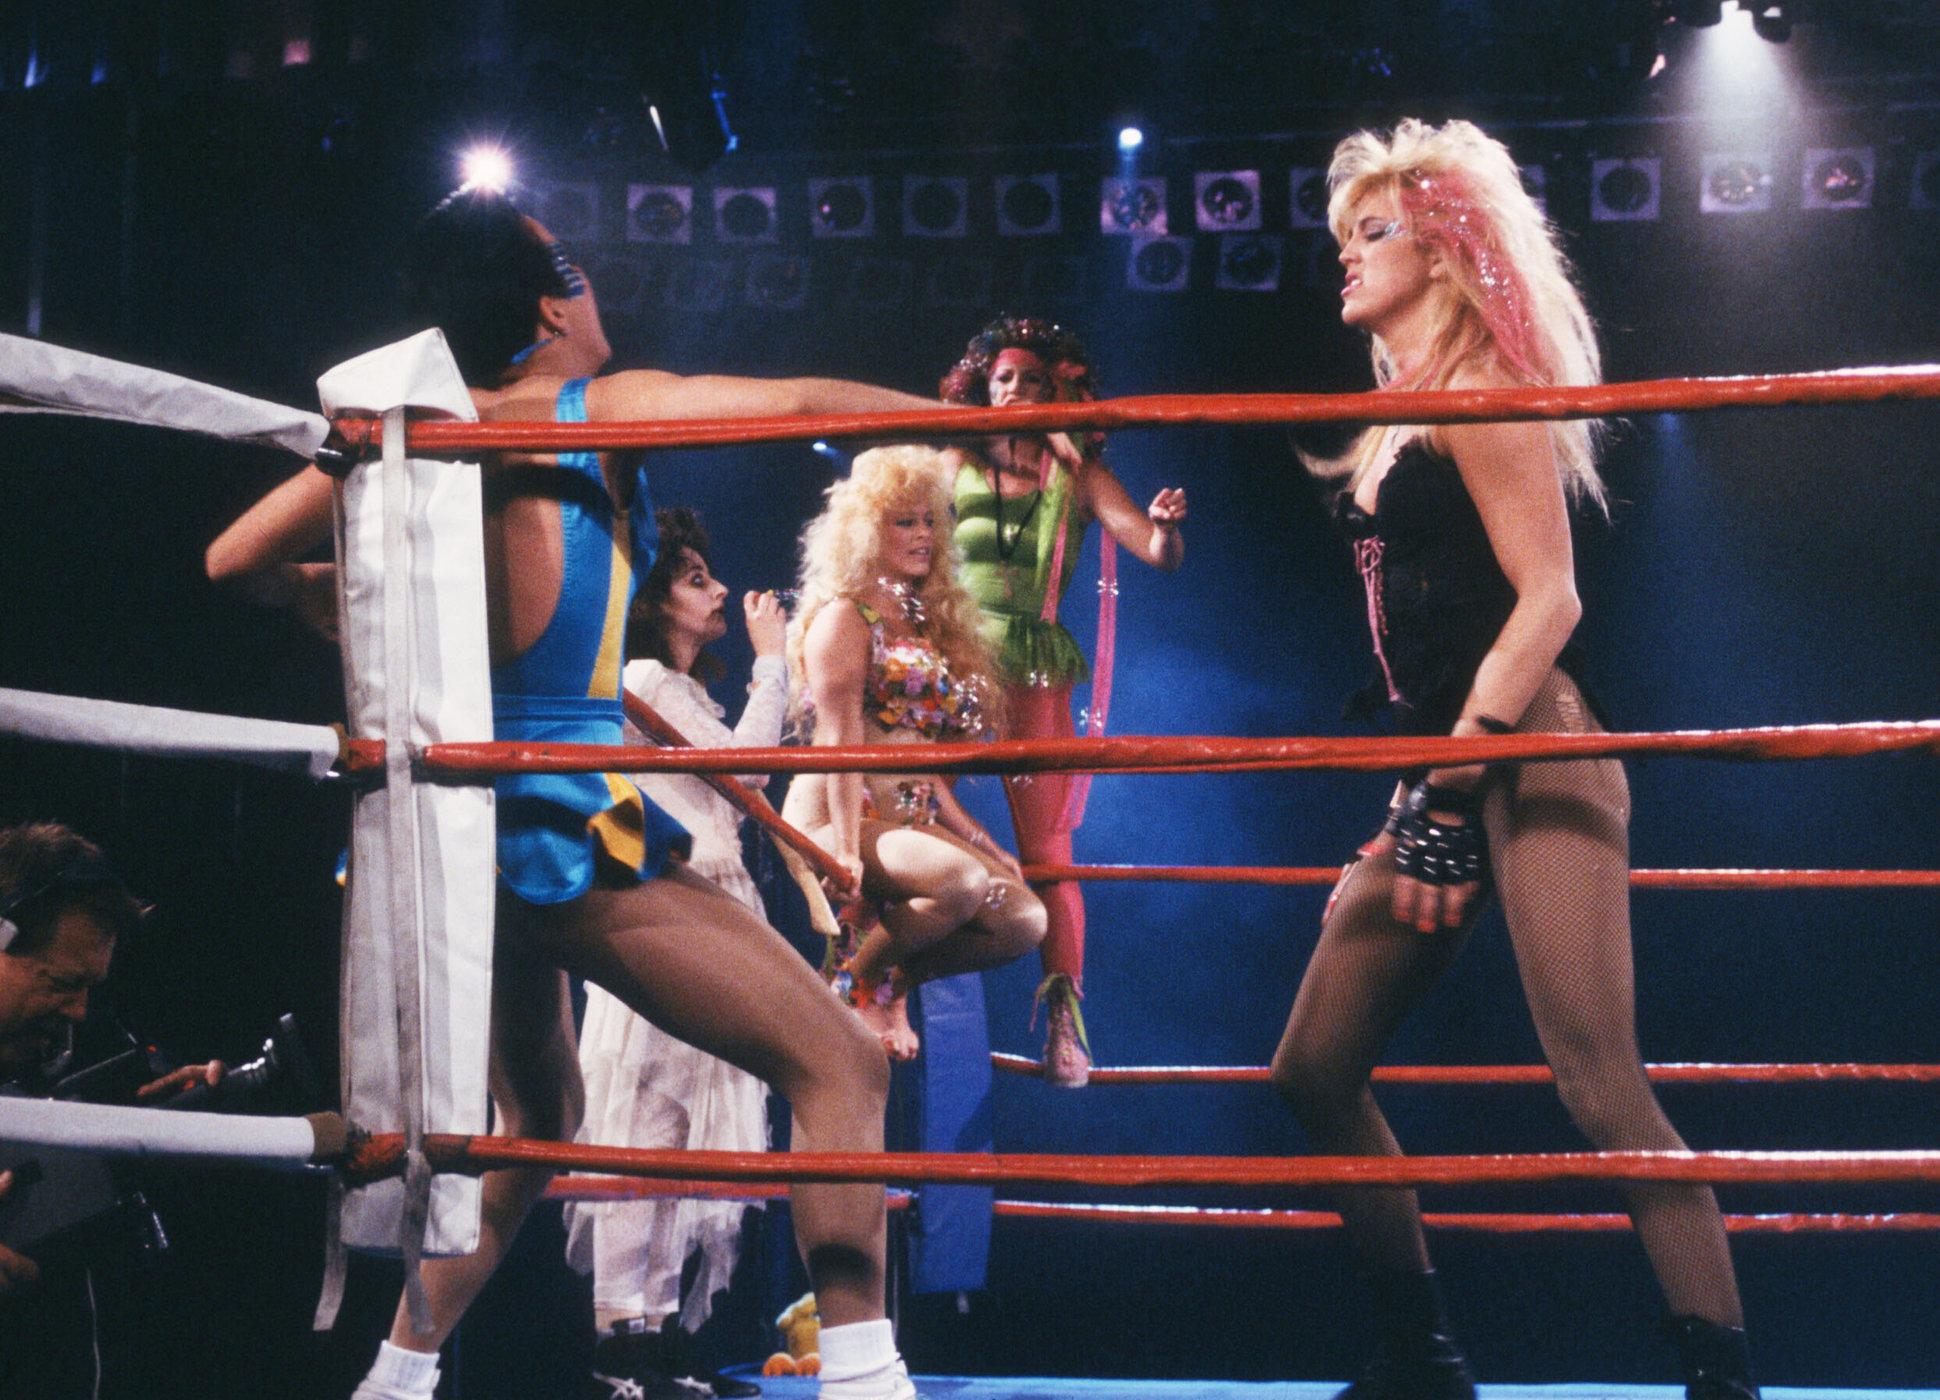 c838c70d9faed1 How GLOW Wrestling Star Jeanne Basone Makes Money From Secret Hotel Fights  - Thrillist